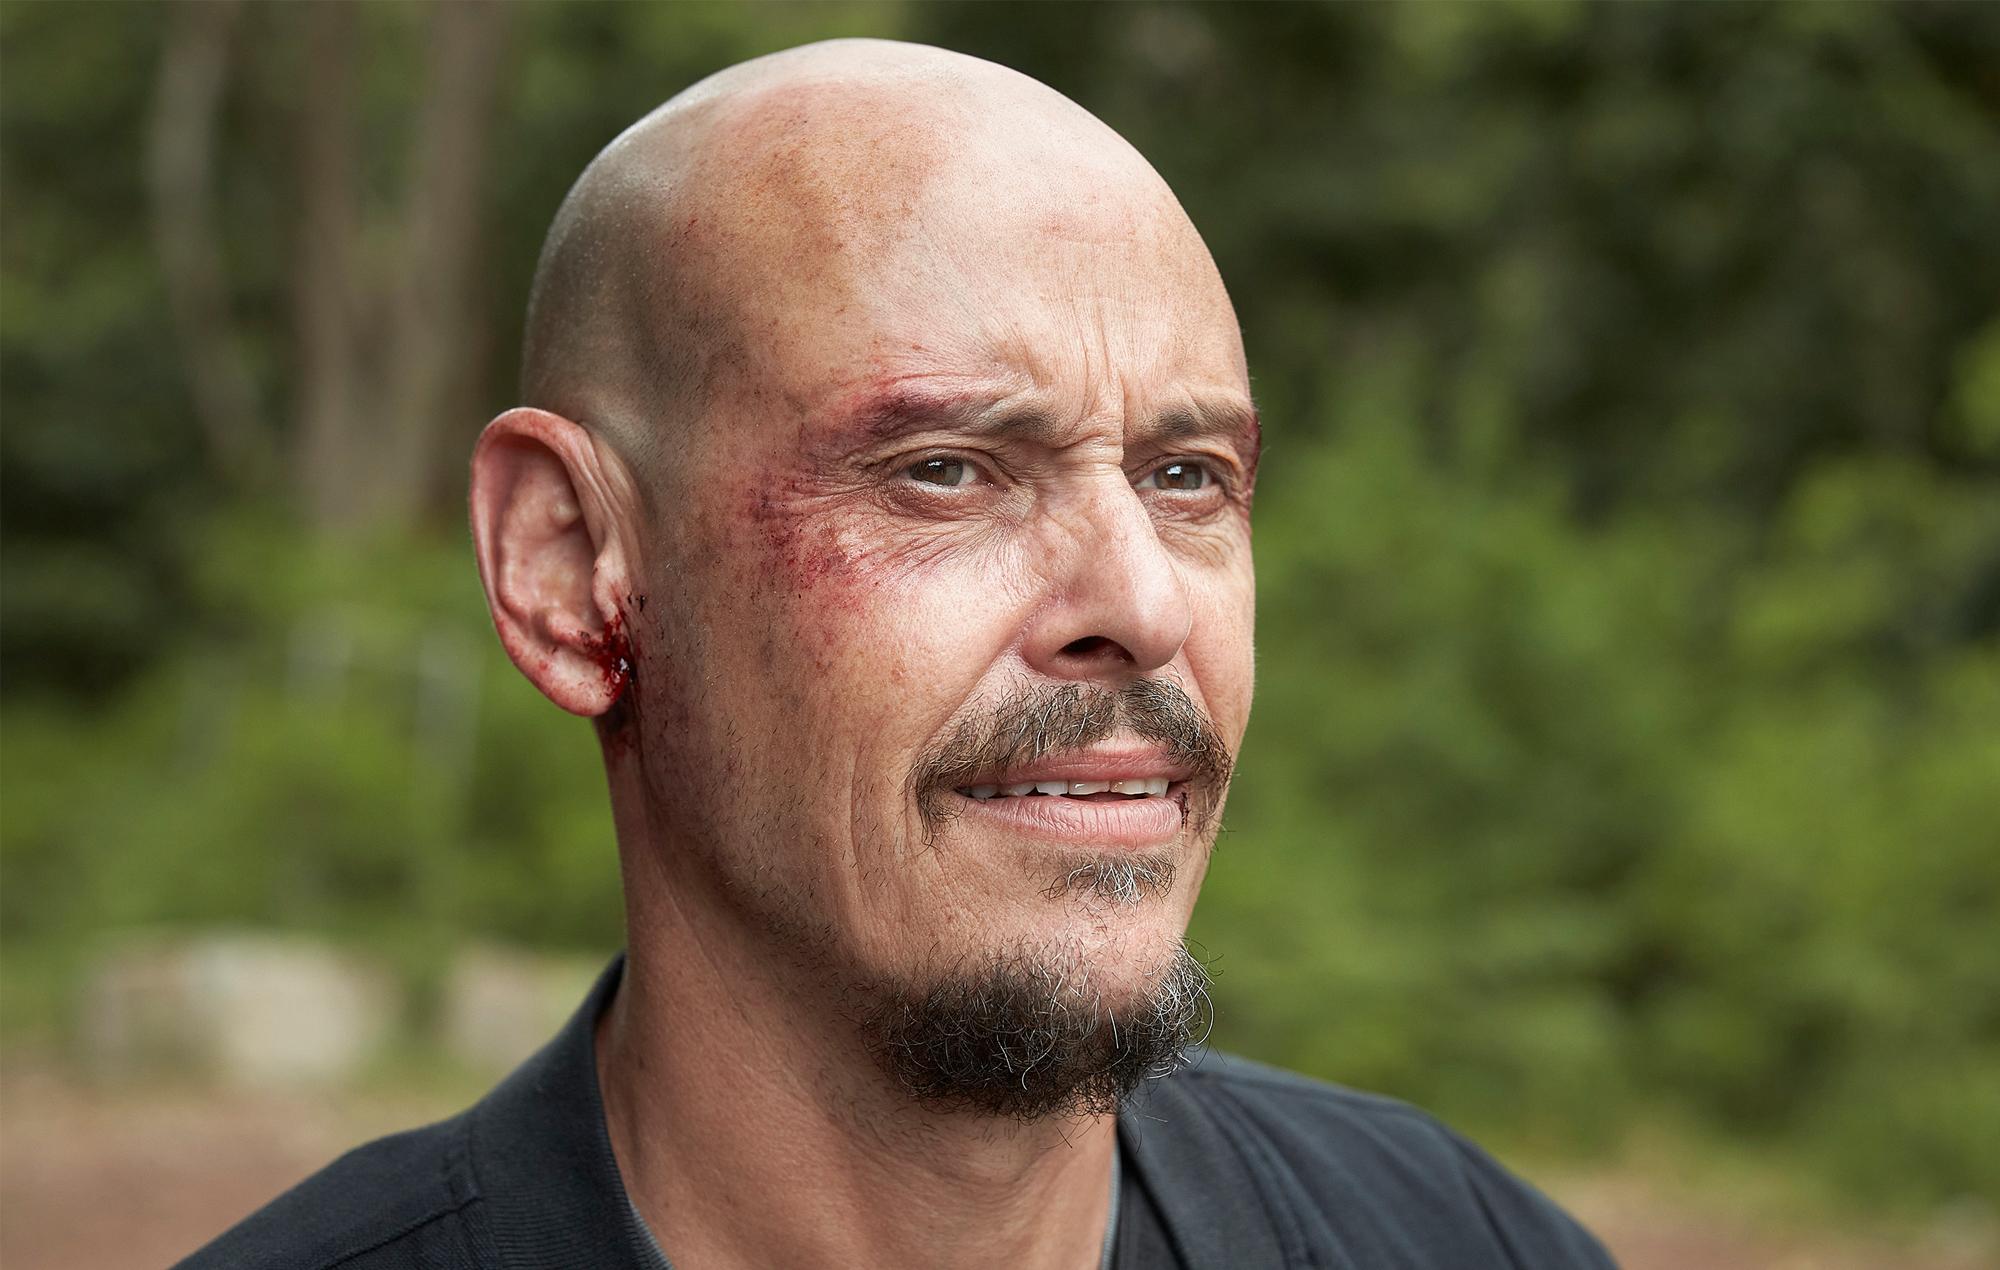 Mr Inbetween Sydney hitman series Foxtel Binge Nash Edgerton Scott Ryan final season 3